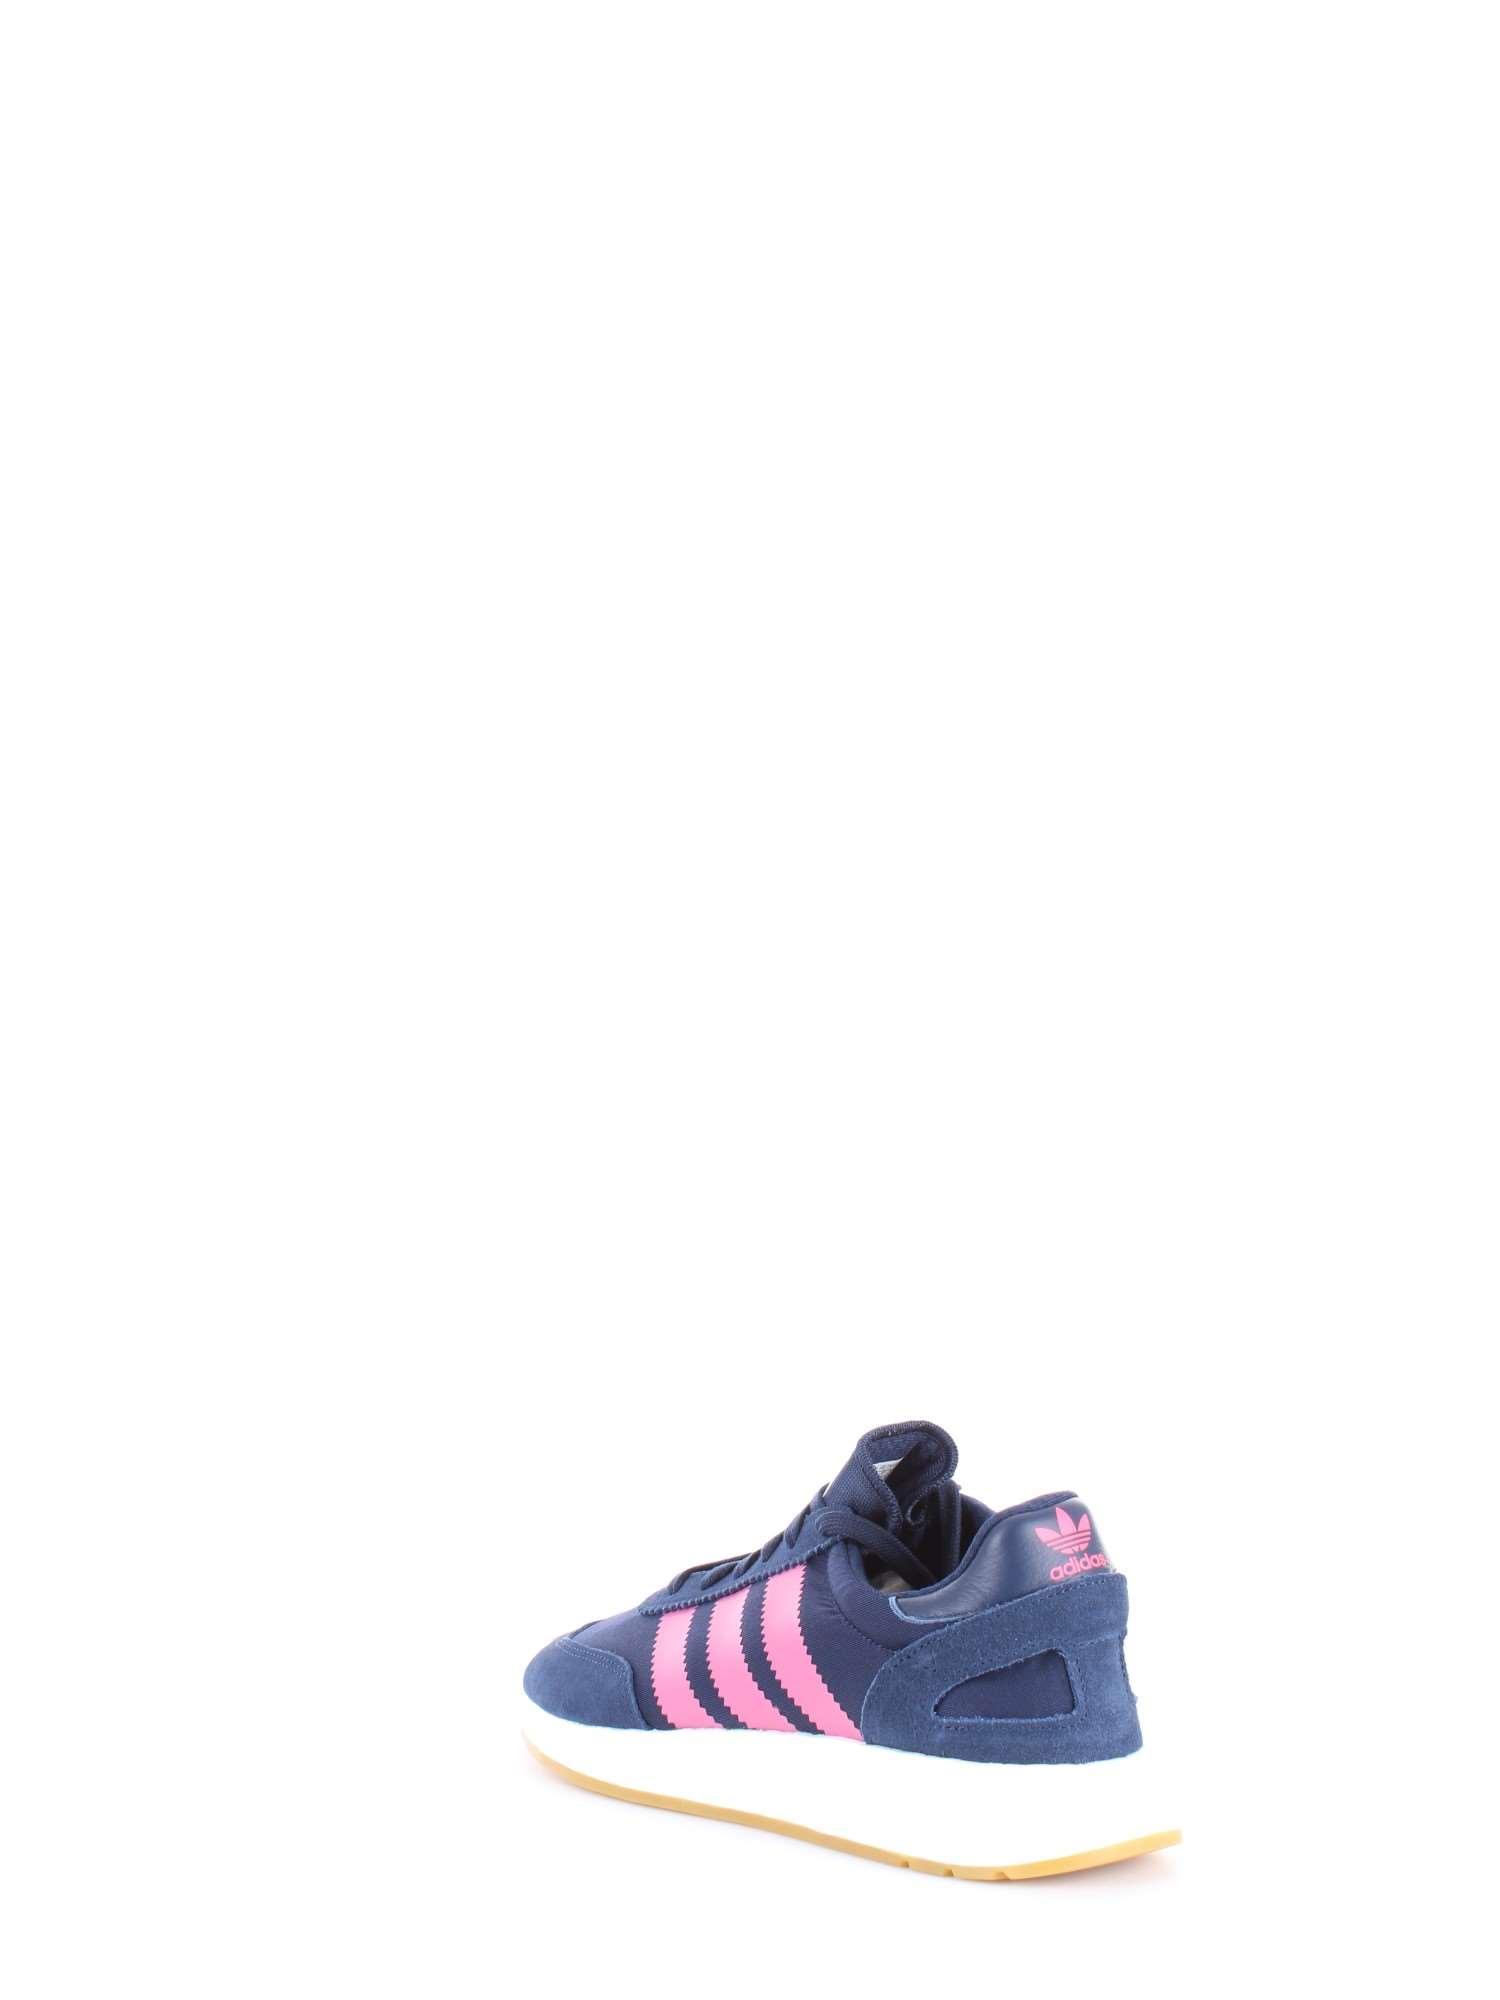 Printemps Bleu Homme blu Adidas Fuchsia Db3012 Sneakers 4qOxpaw